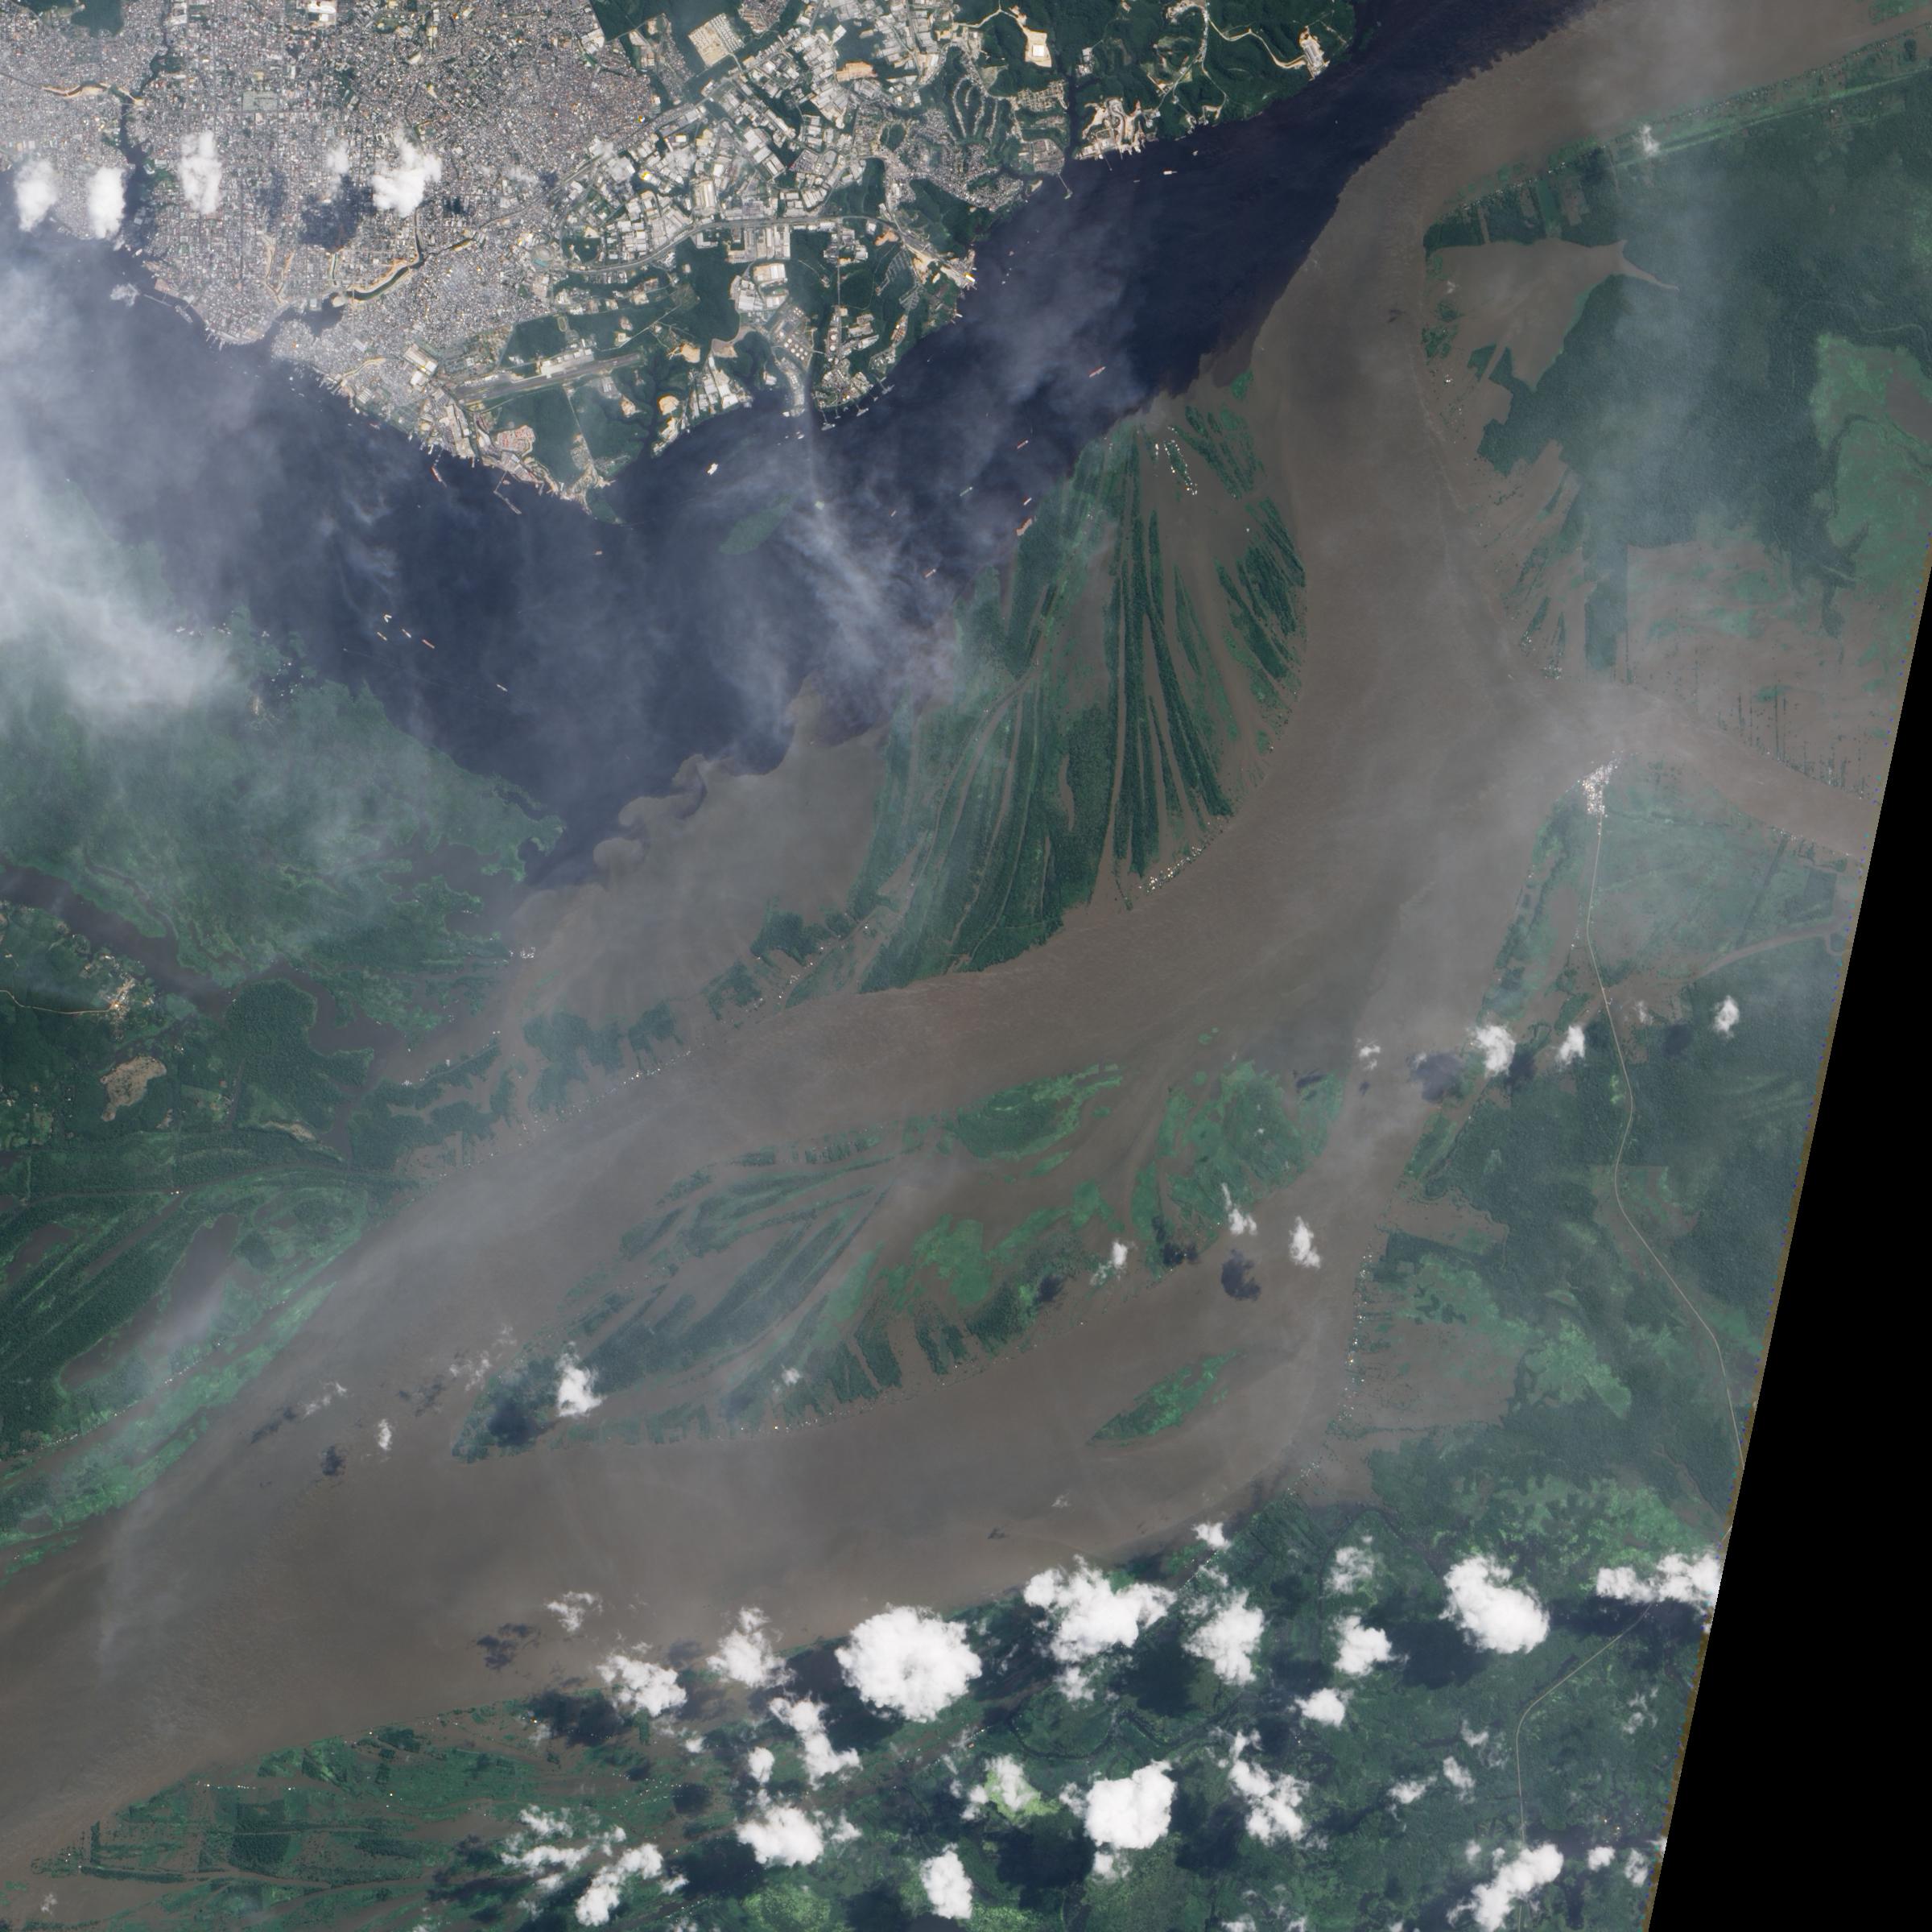 5a6c9c3c85f Flooding near Manaus